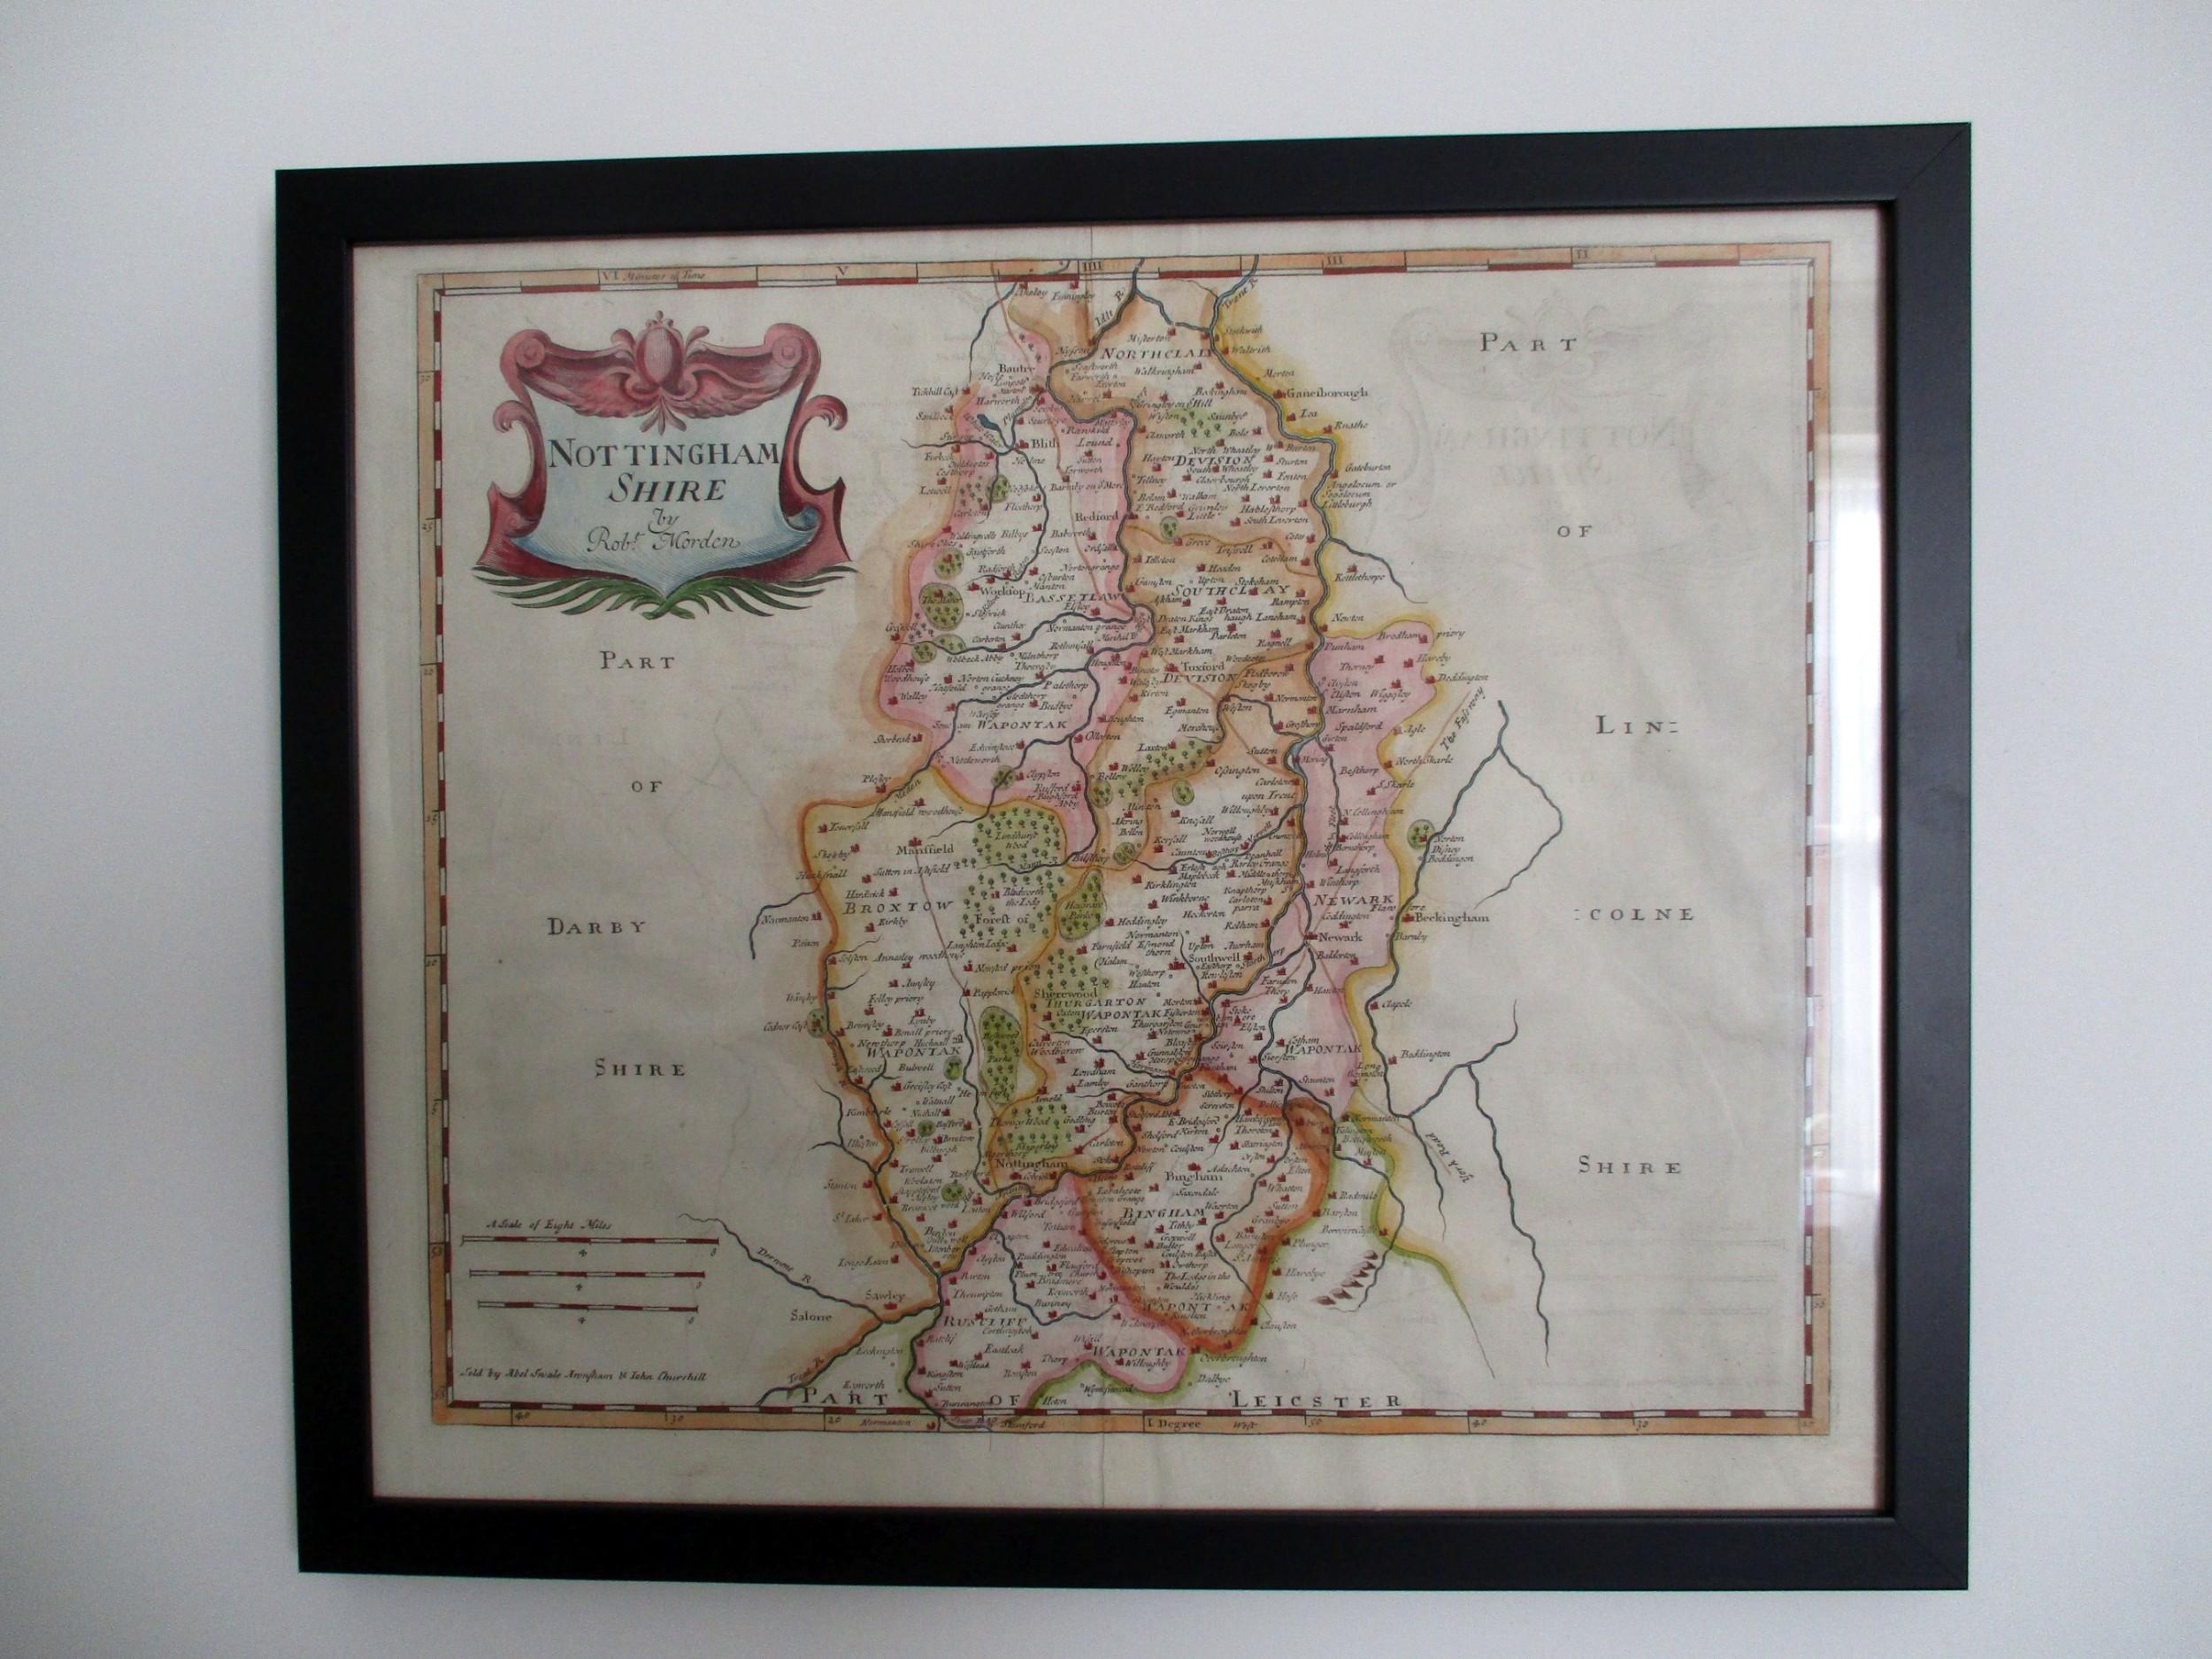 c1700 morden map of nottinghamshire